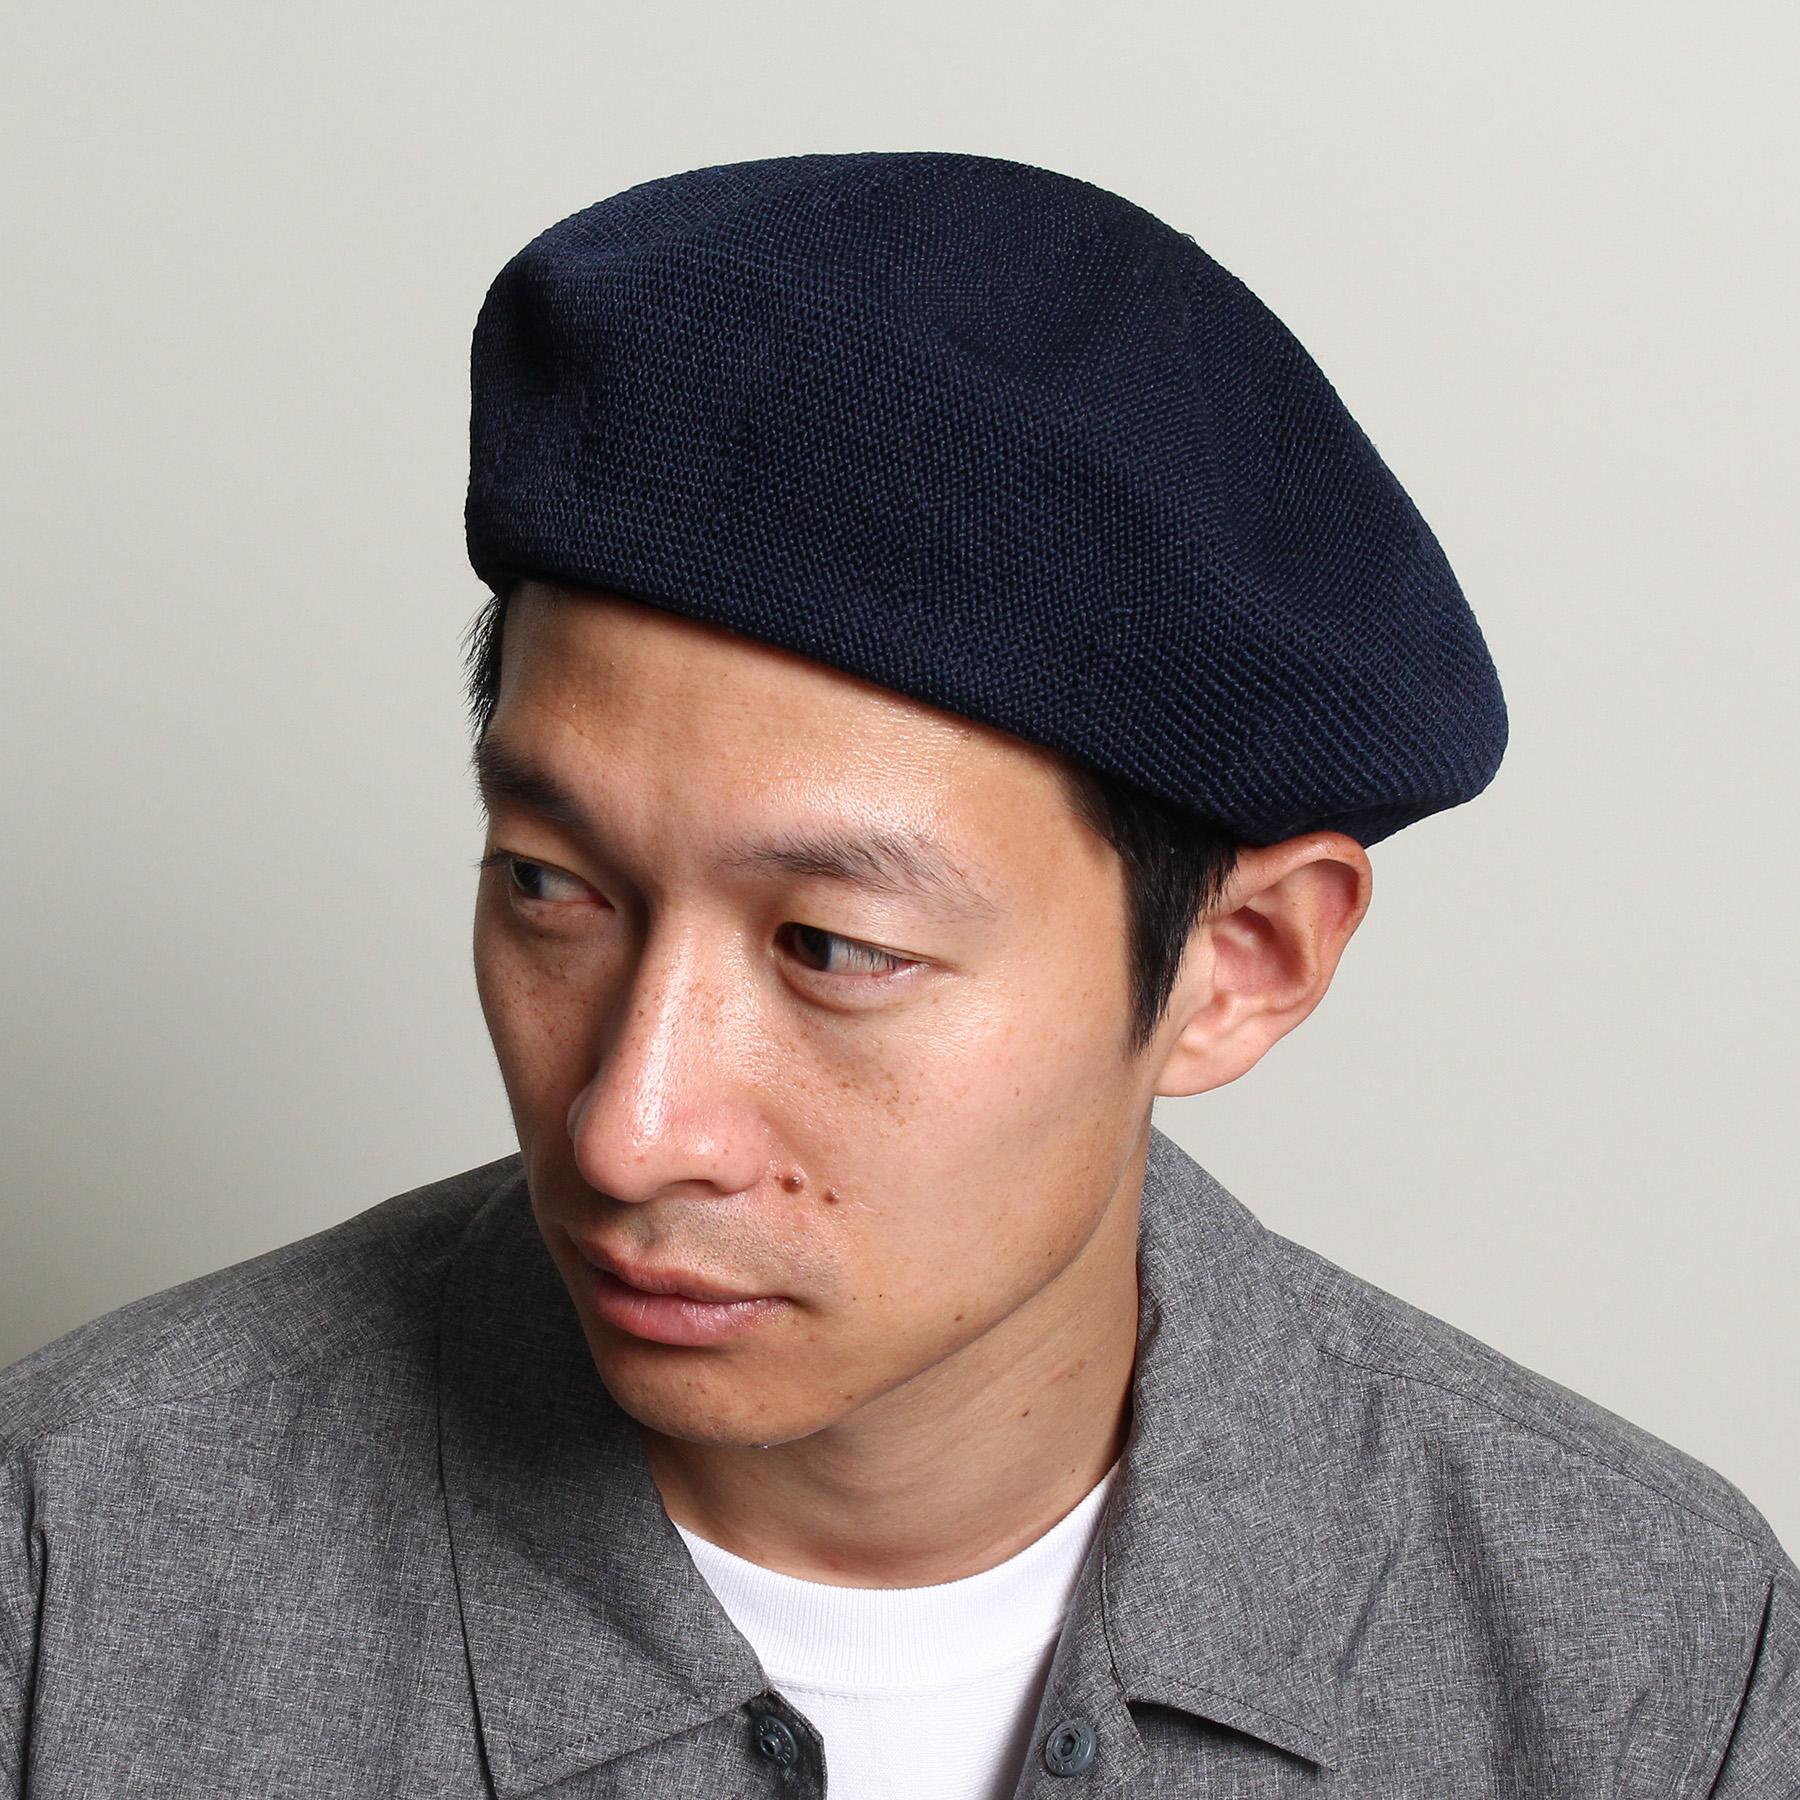 【THE SHOP TK(Men) (ザ ショップ ティーケー(メンズ))】サーモベレーメンズ 帽子|ハンチング・ベレー帽 ネイビー